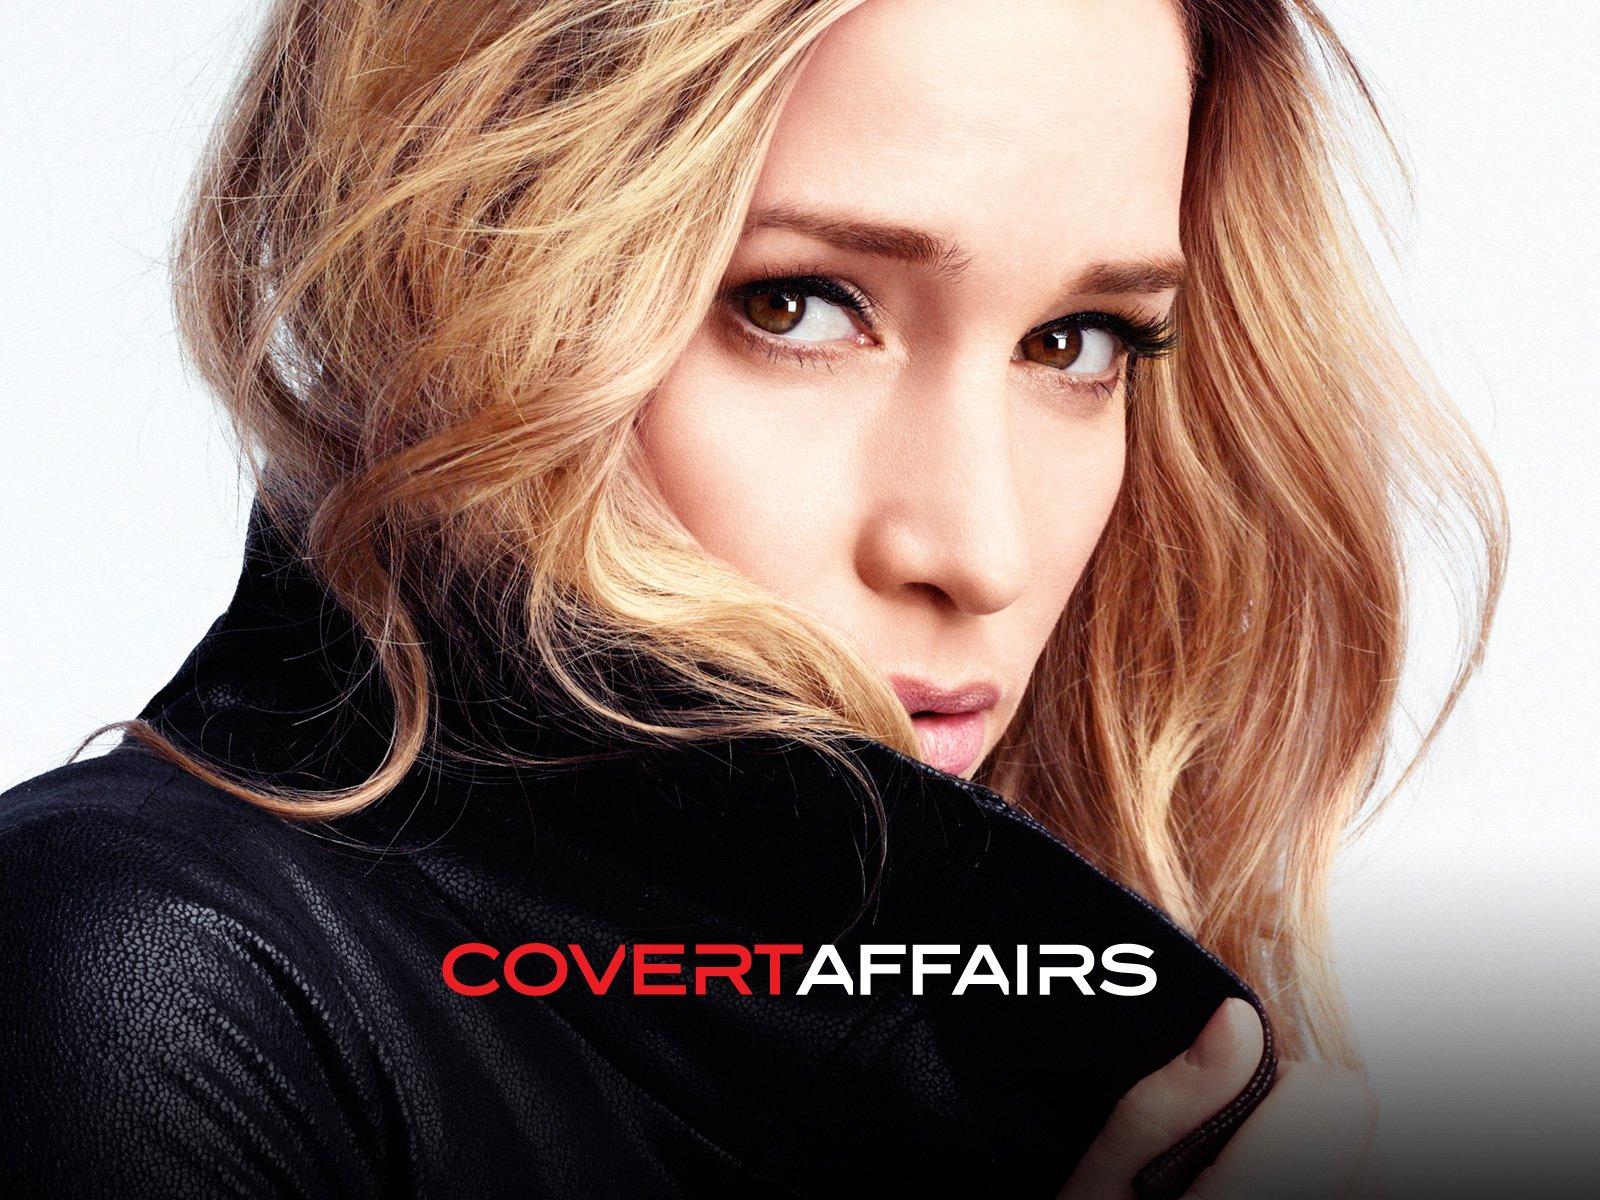 covert affairs season 4 episode 14